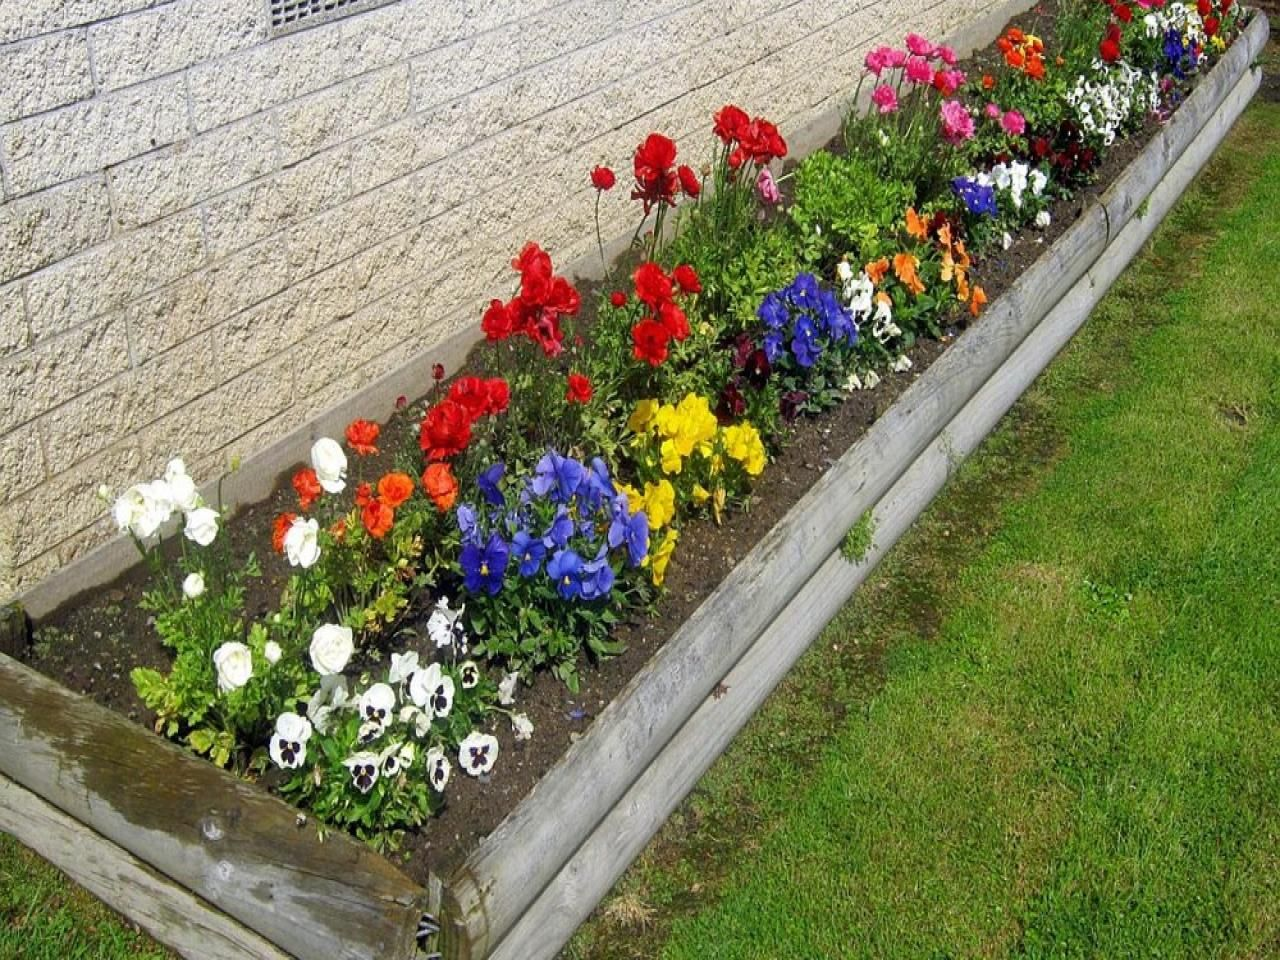 46 popular ideas for a small rectangular flower bed